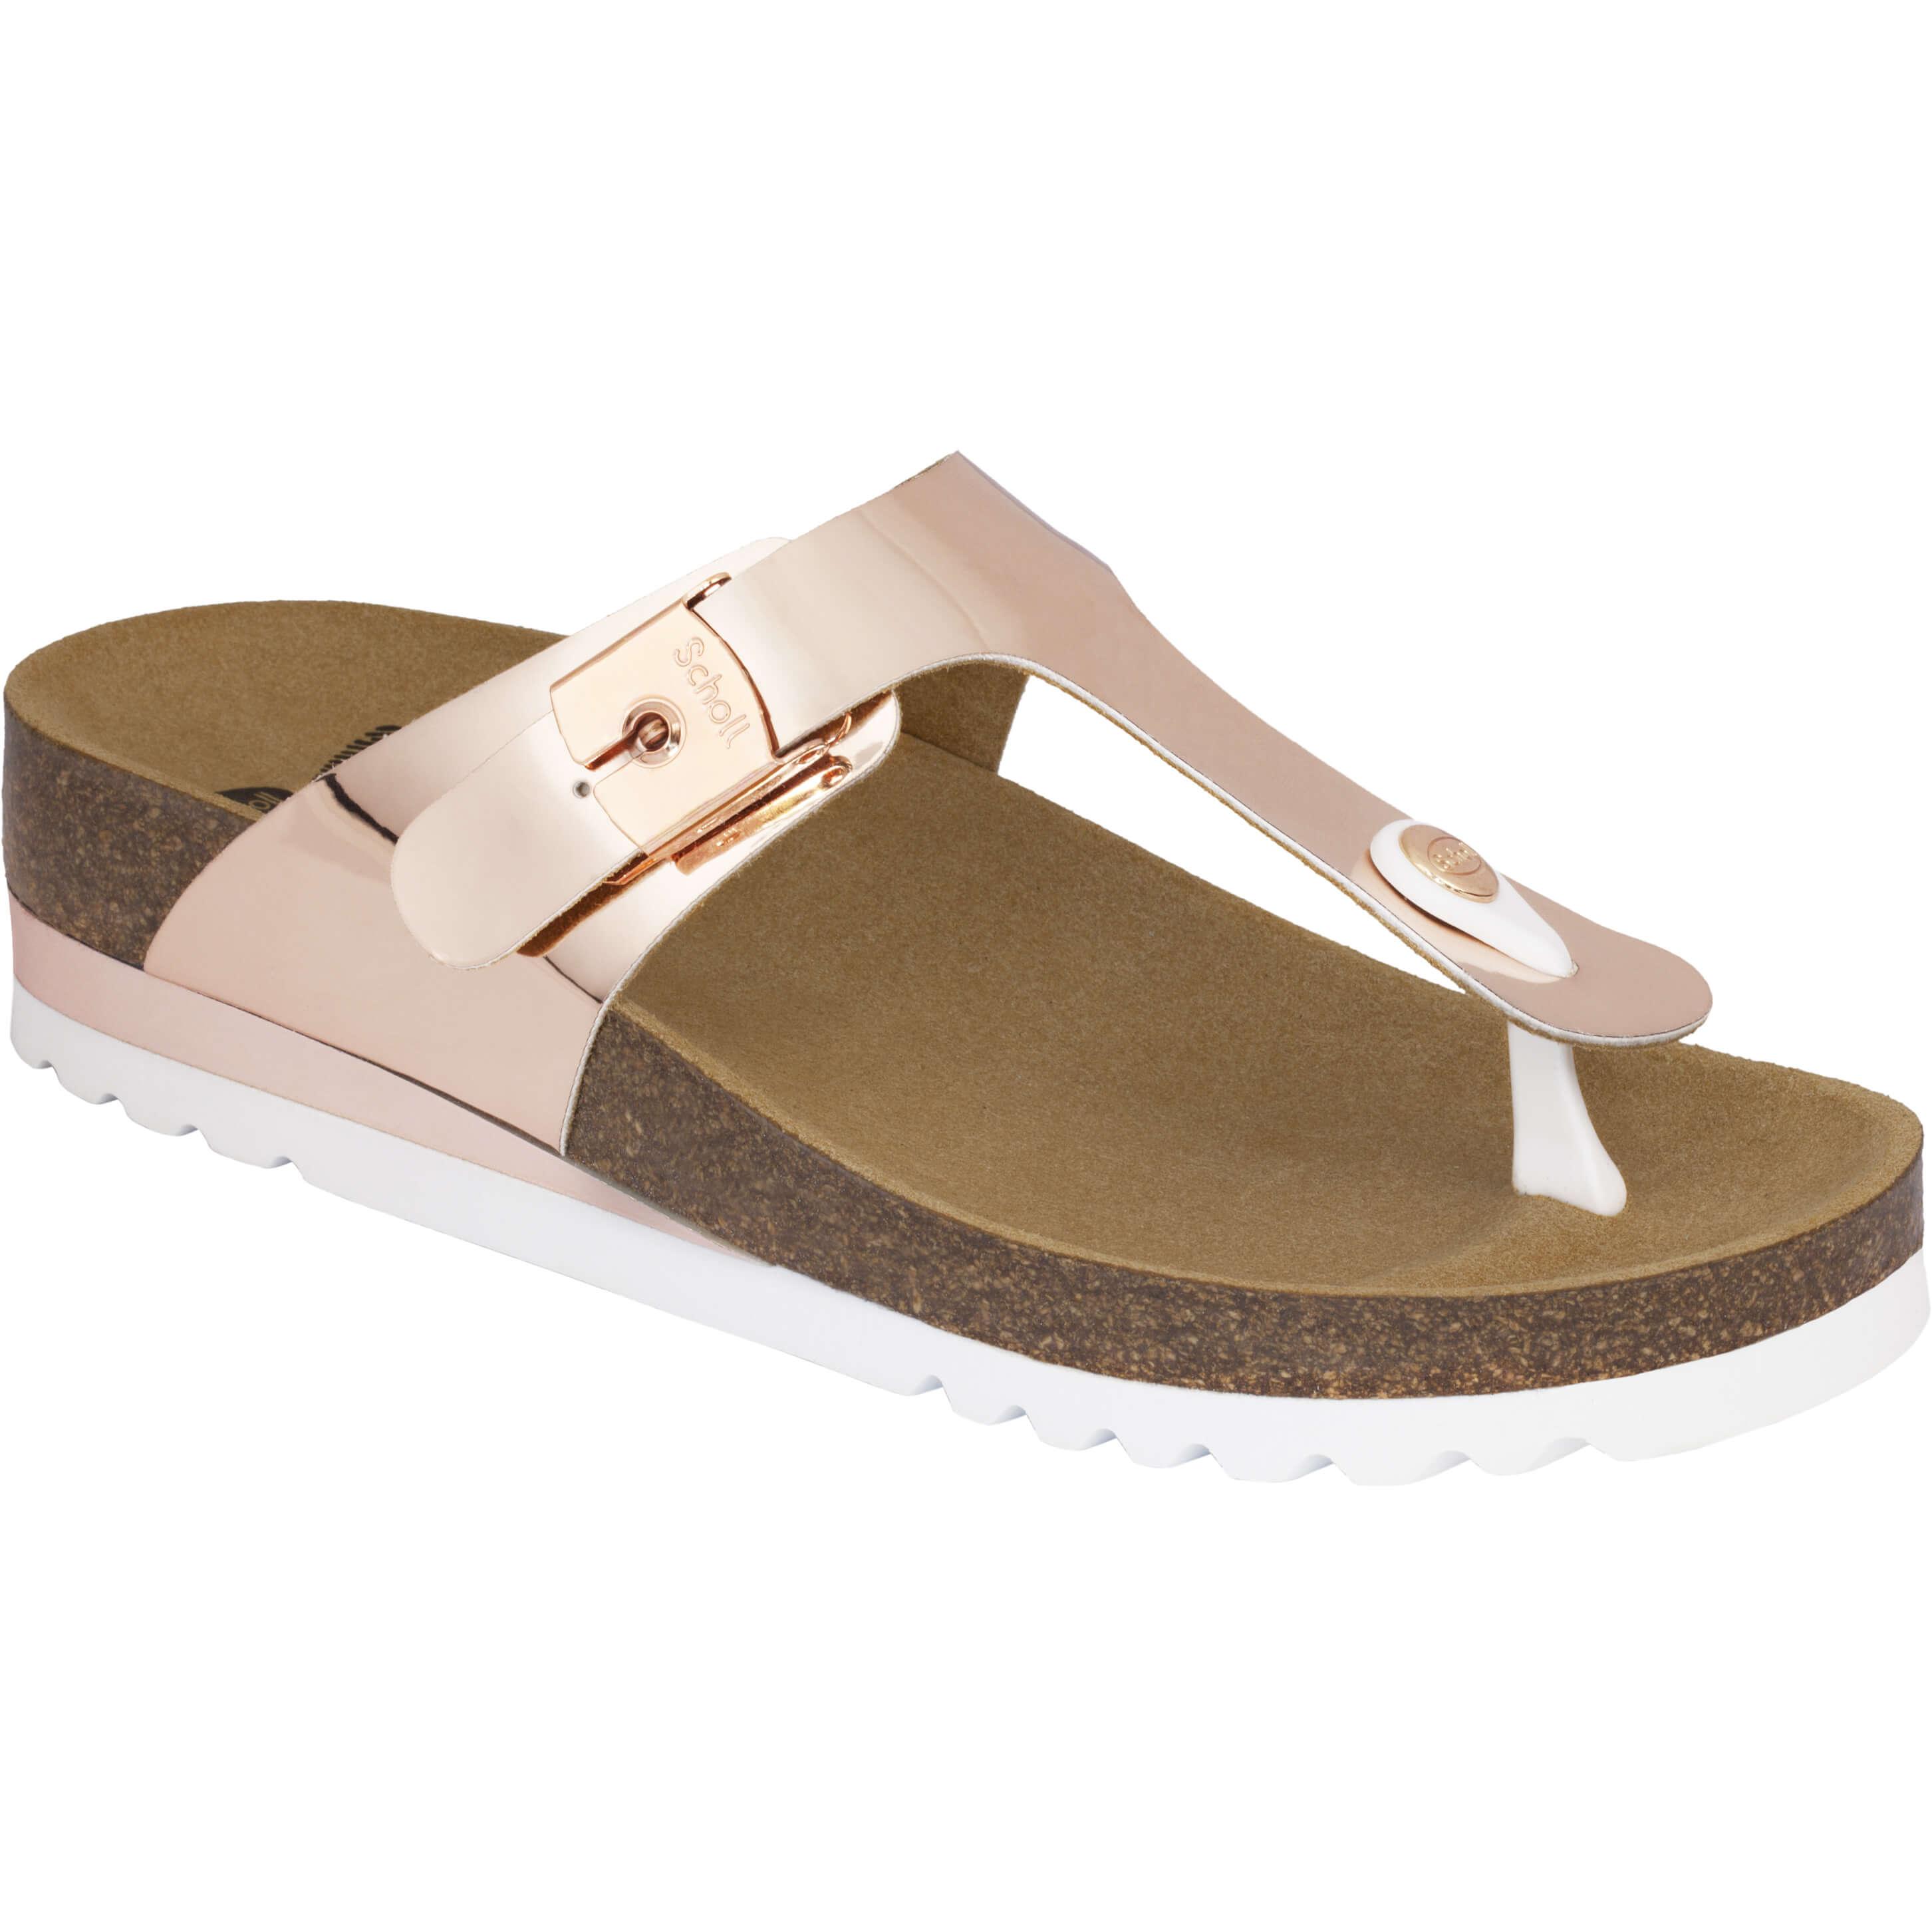 d9d38f8cce7 Dr Scholl Shoes Glam SS 1 Bronze ΝΕΟ Γυναικεία Ανατομικά Παπούτσια Χαρίζουν  Σωστή Στάση & Φυσικό